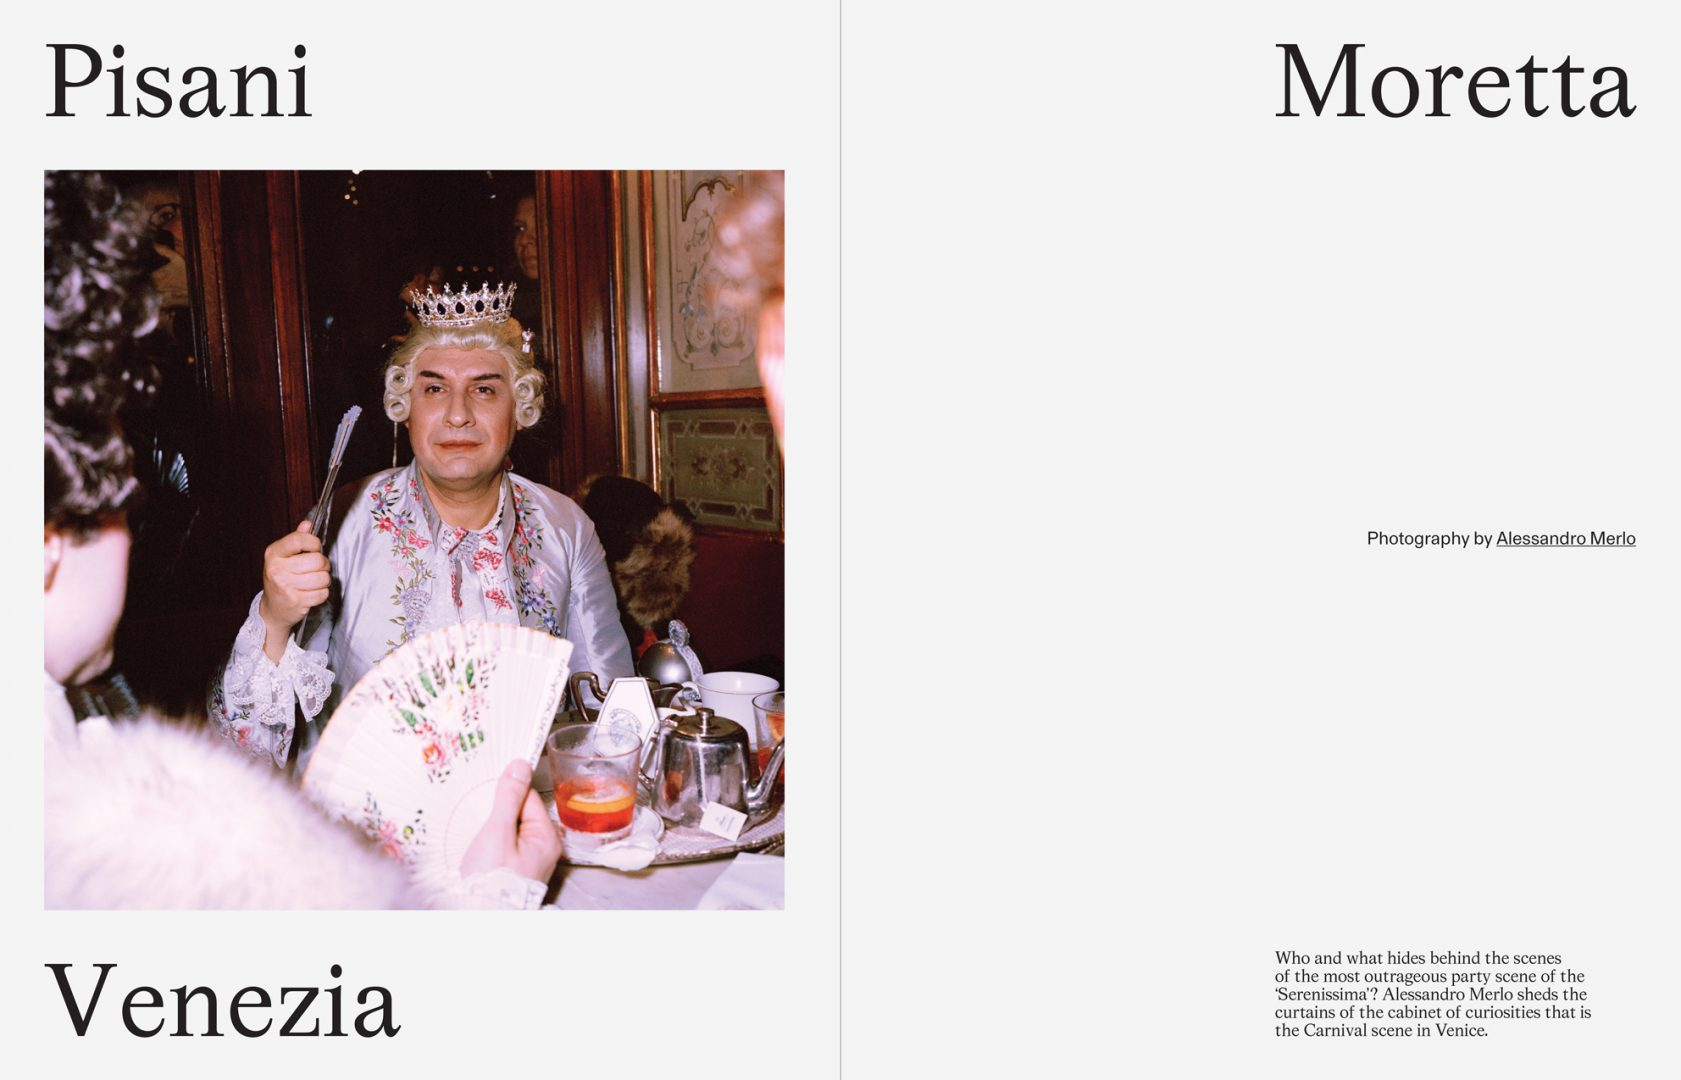 Sali e Tabacchi Journal, Pisani Moretta Venezia, Photographed by Alessandro Merlo